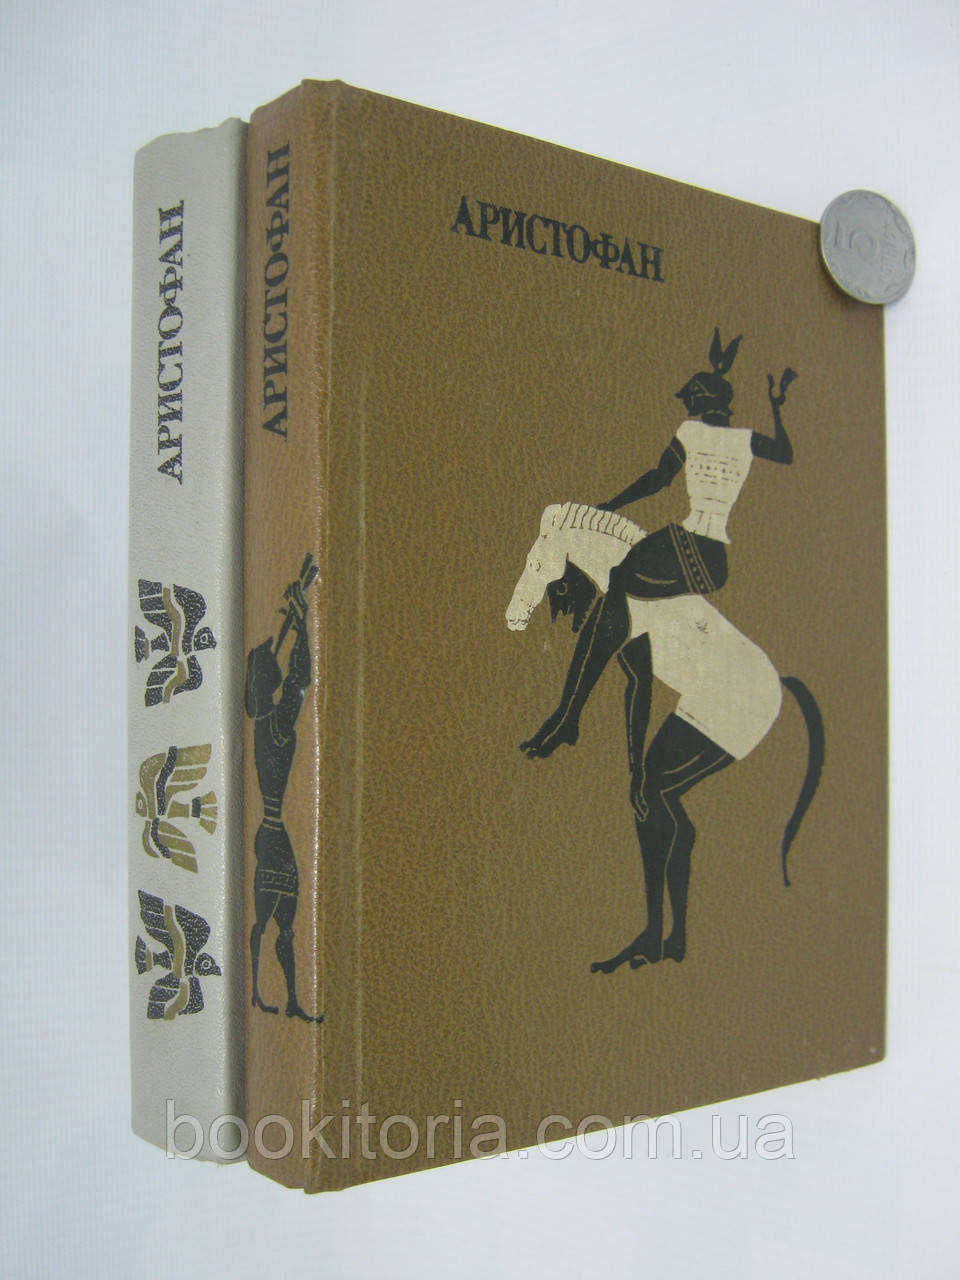 Аристофан. Комедии. В двух томах (б/у).